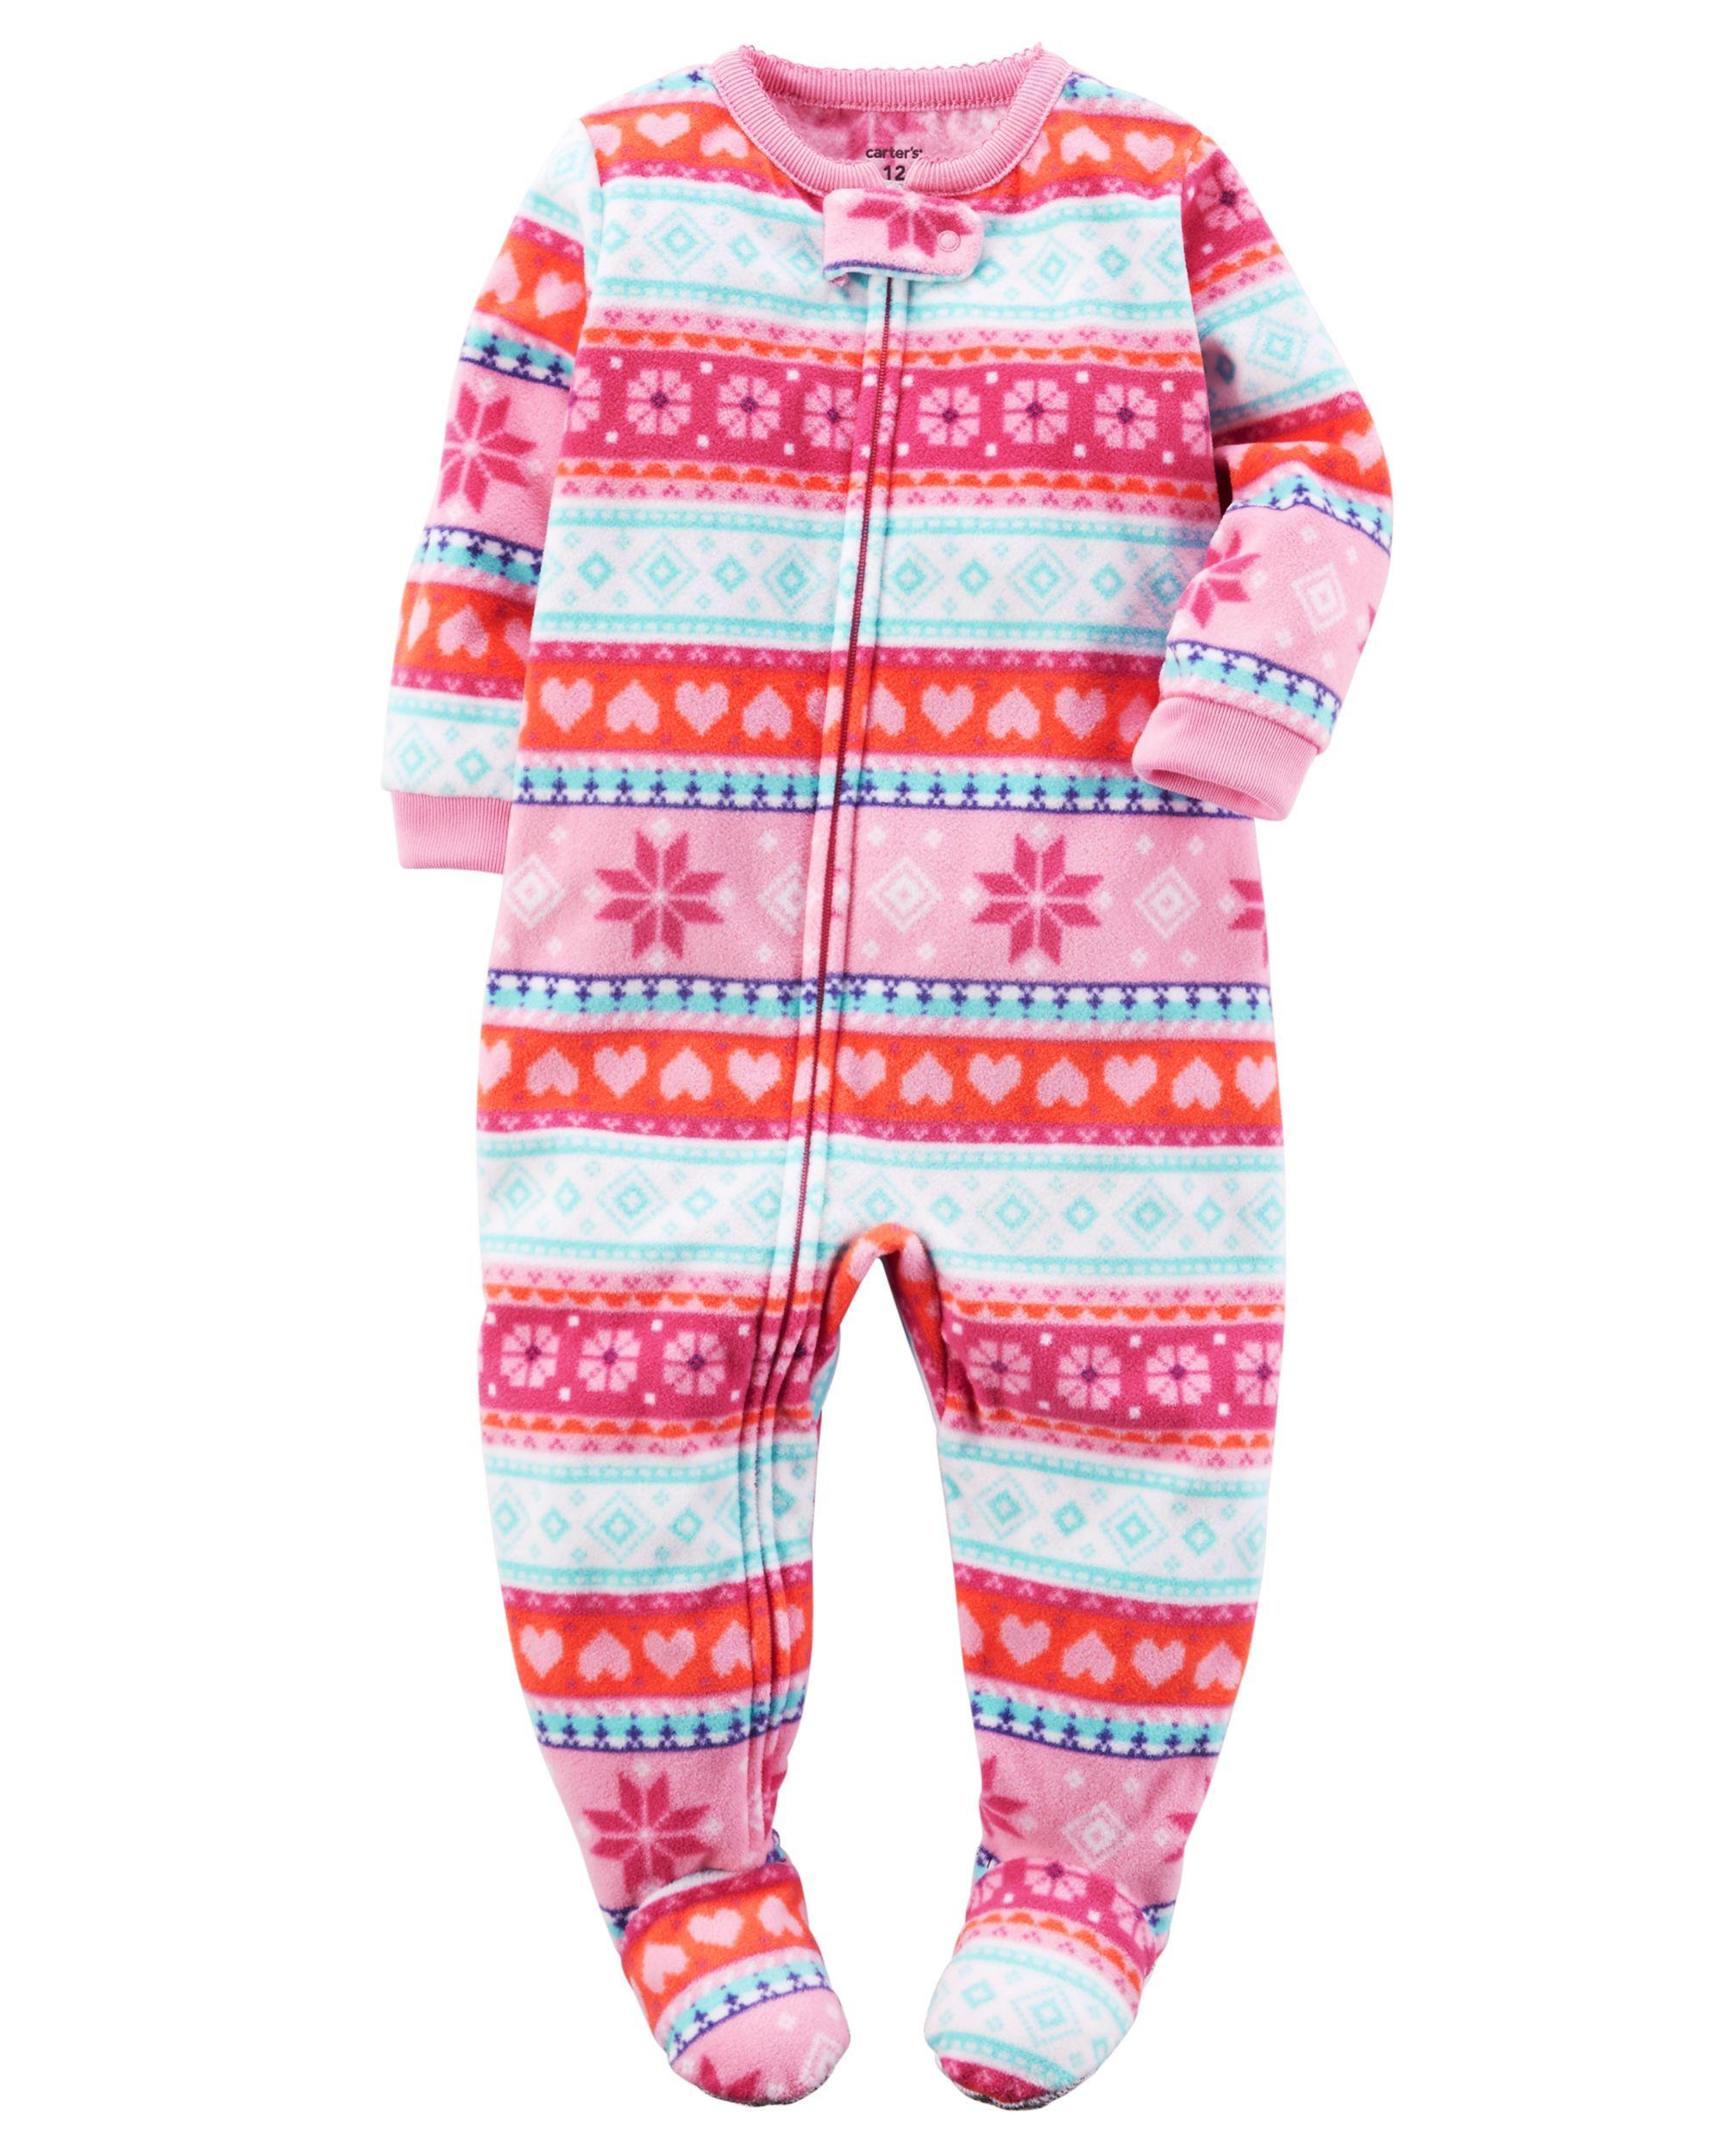 66e0fde14 Crafted in snuggly fleece with an allover polka dot print